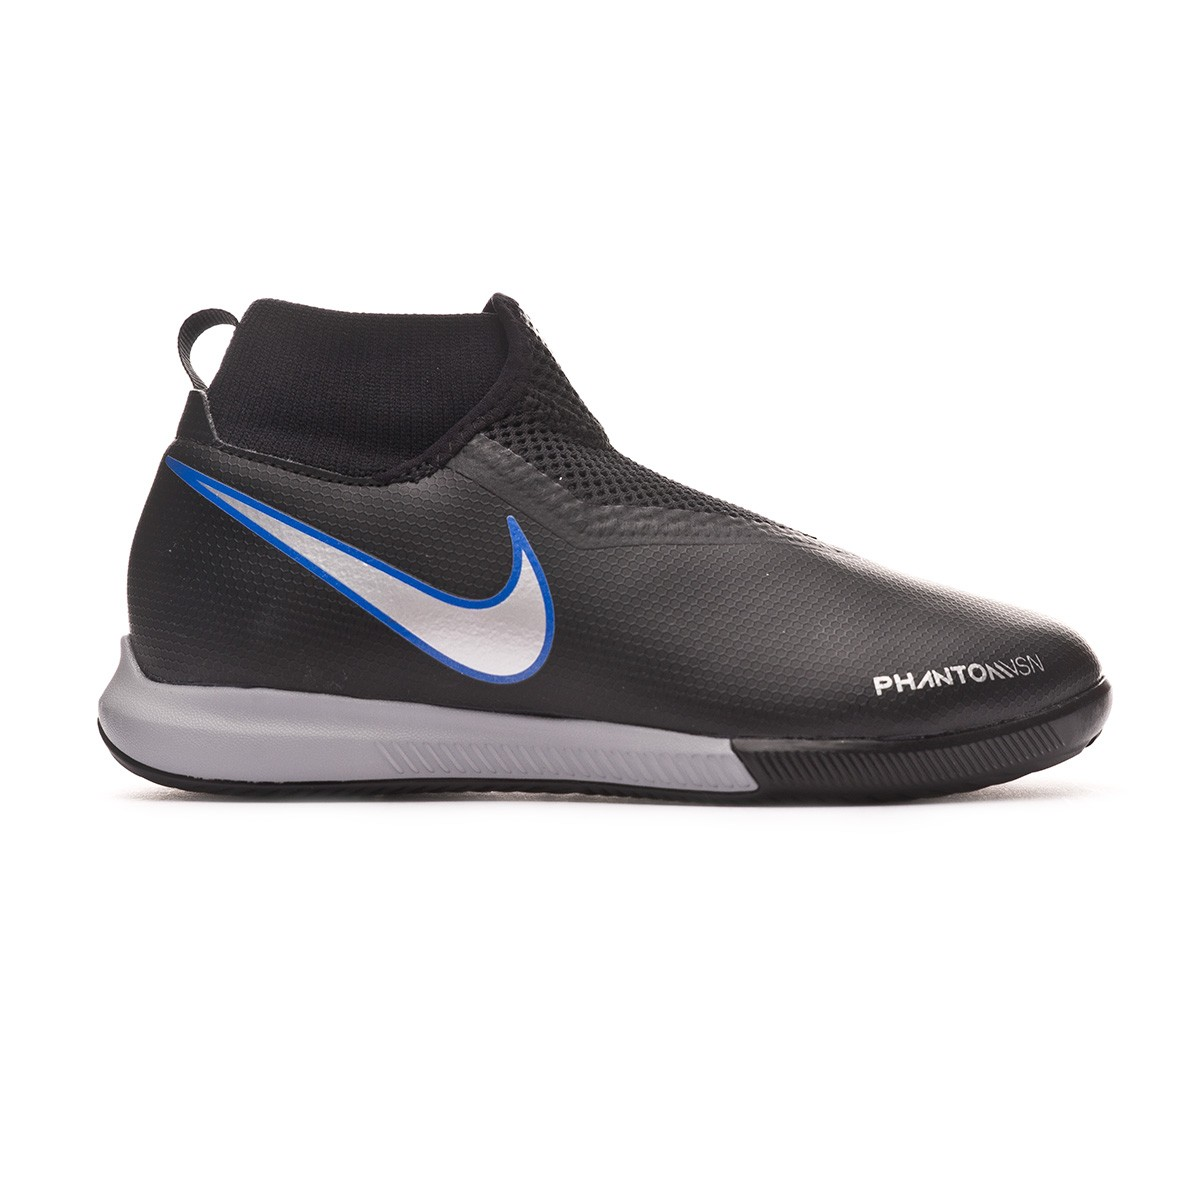 9eea625828b Futsal Boot Nike Phantom Vision Academy DF IC Niño Black-Metallic silver-Racer  blue - Football store Fútbol Emotion